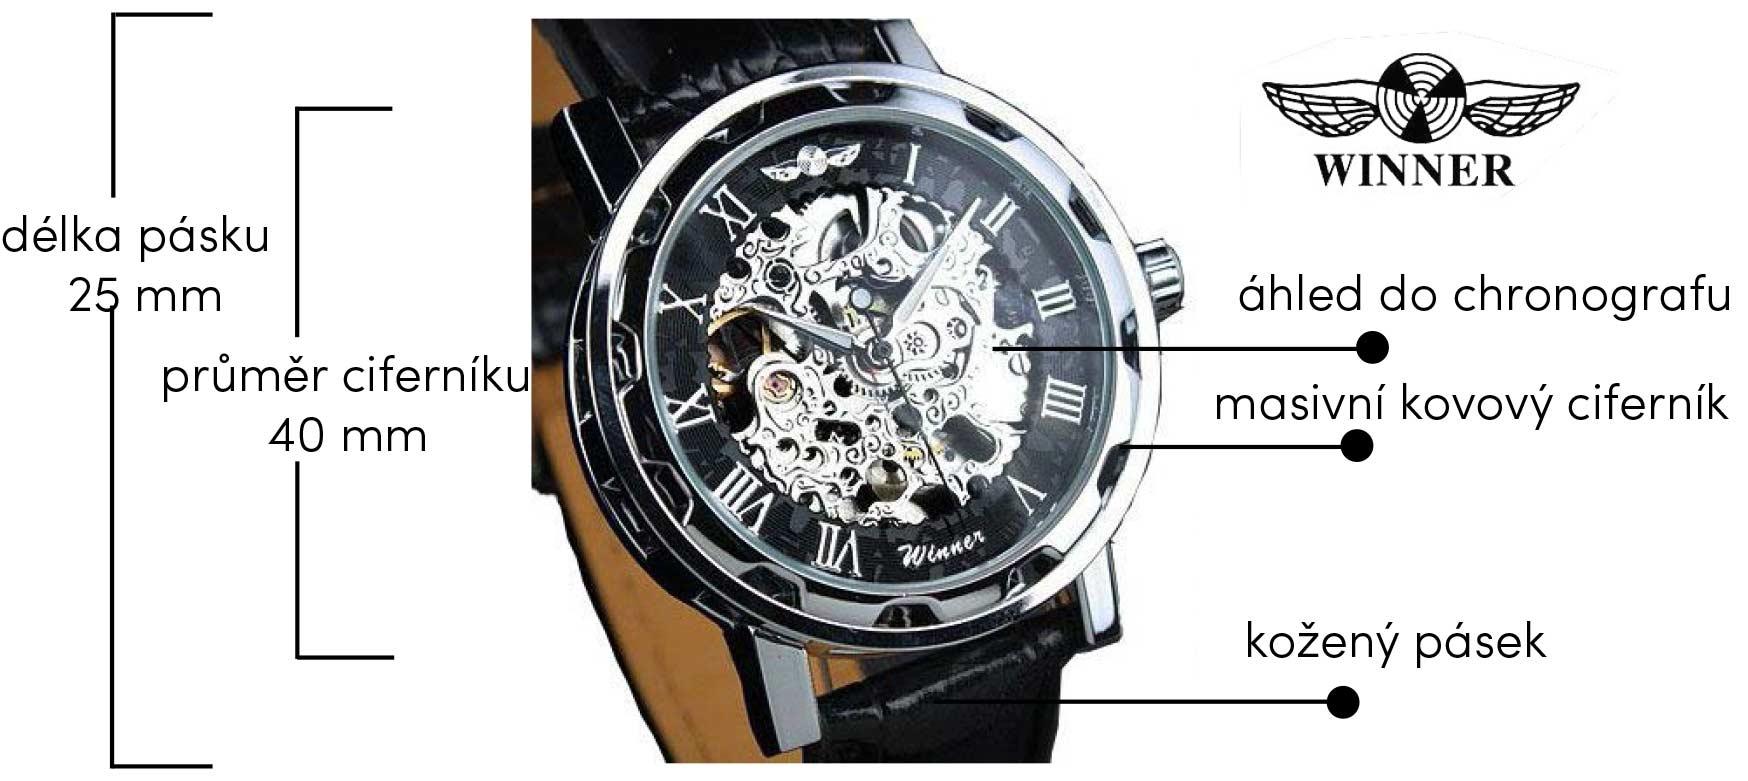 43c3c70d07b Pánské hodinky Winner Skeleton